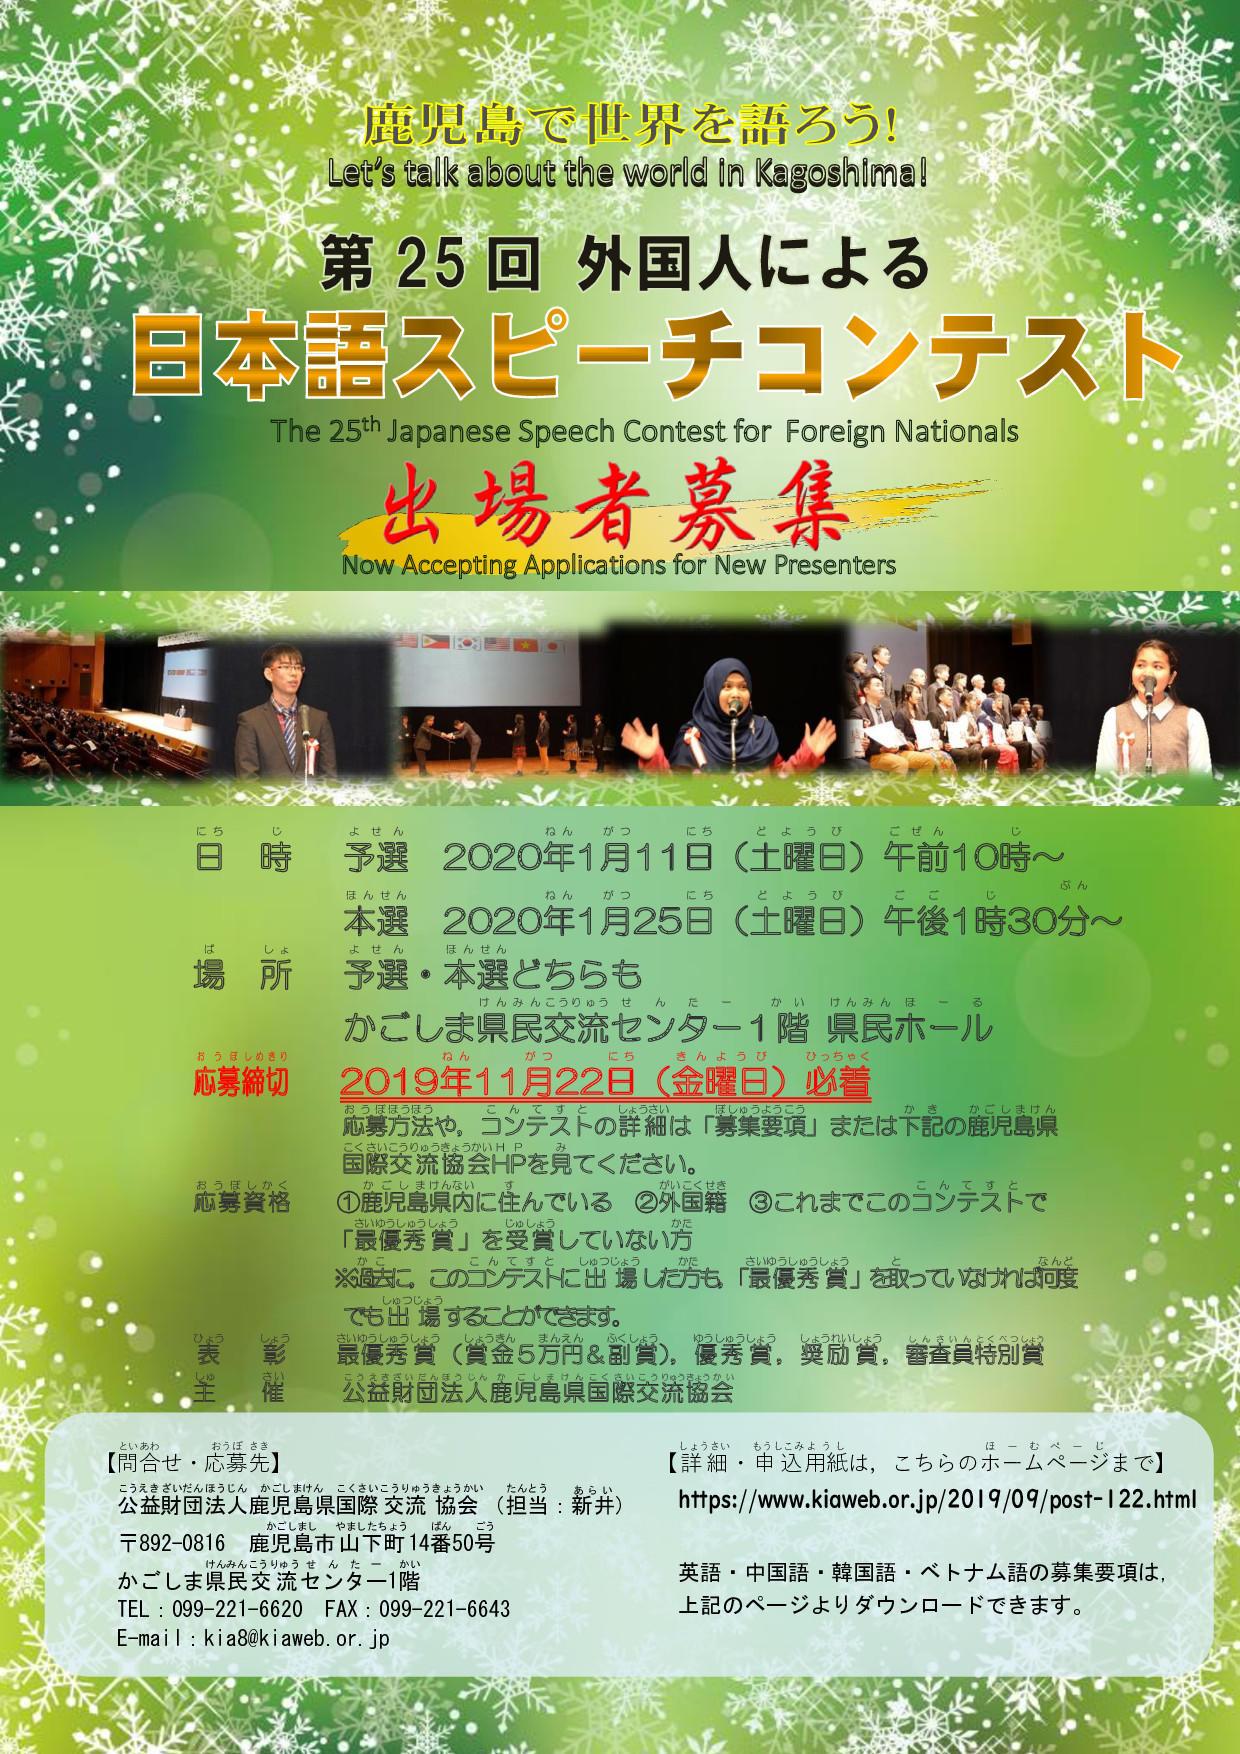 https://www.kiaweb.or.jp/upload/f8009e30438077fc507eaff6e4dc69fea99b77fc.jpg